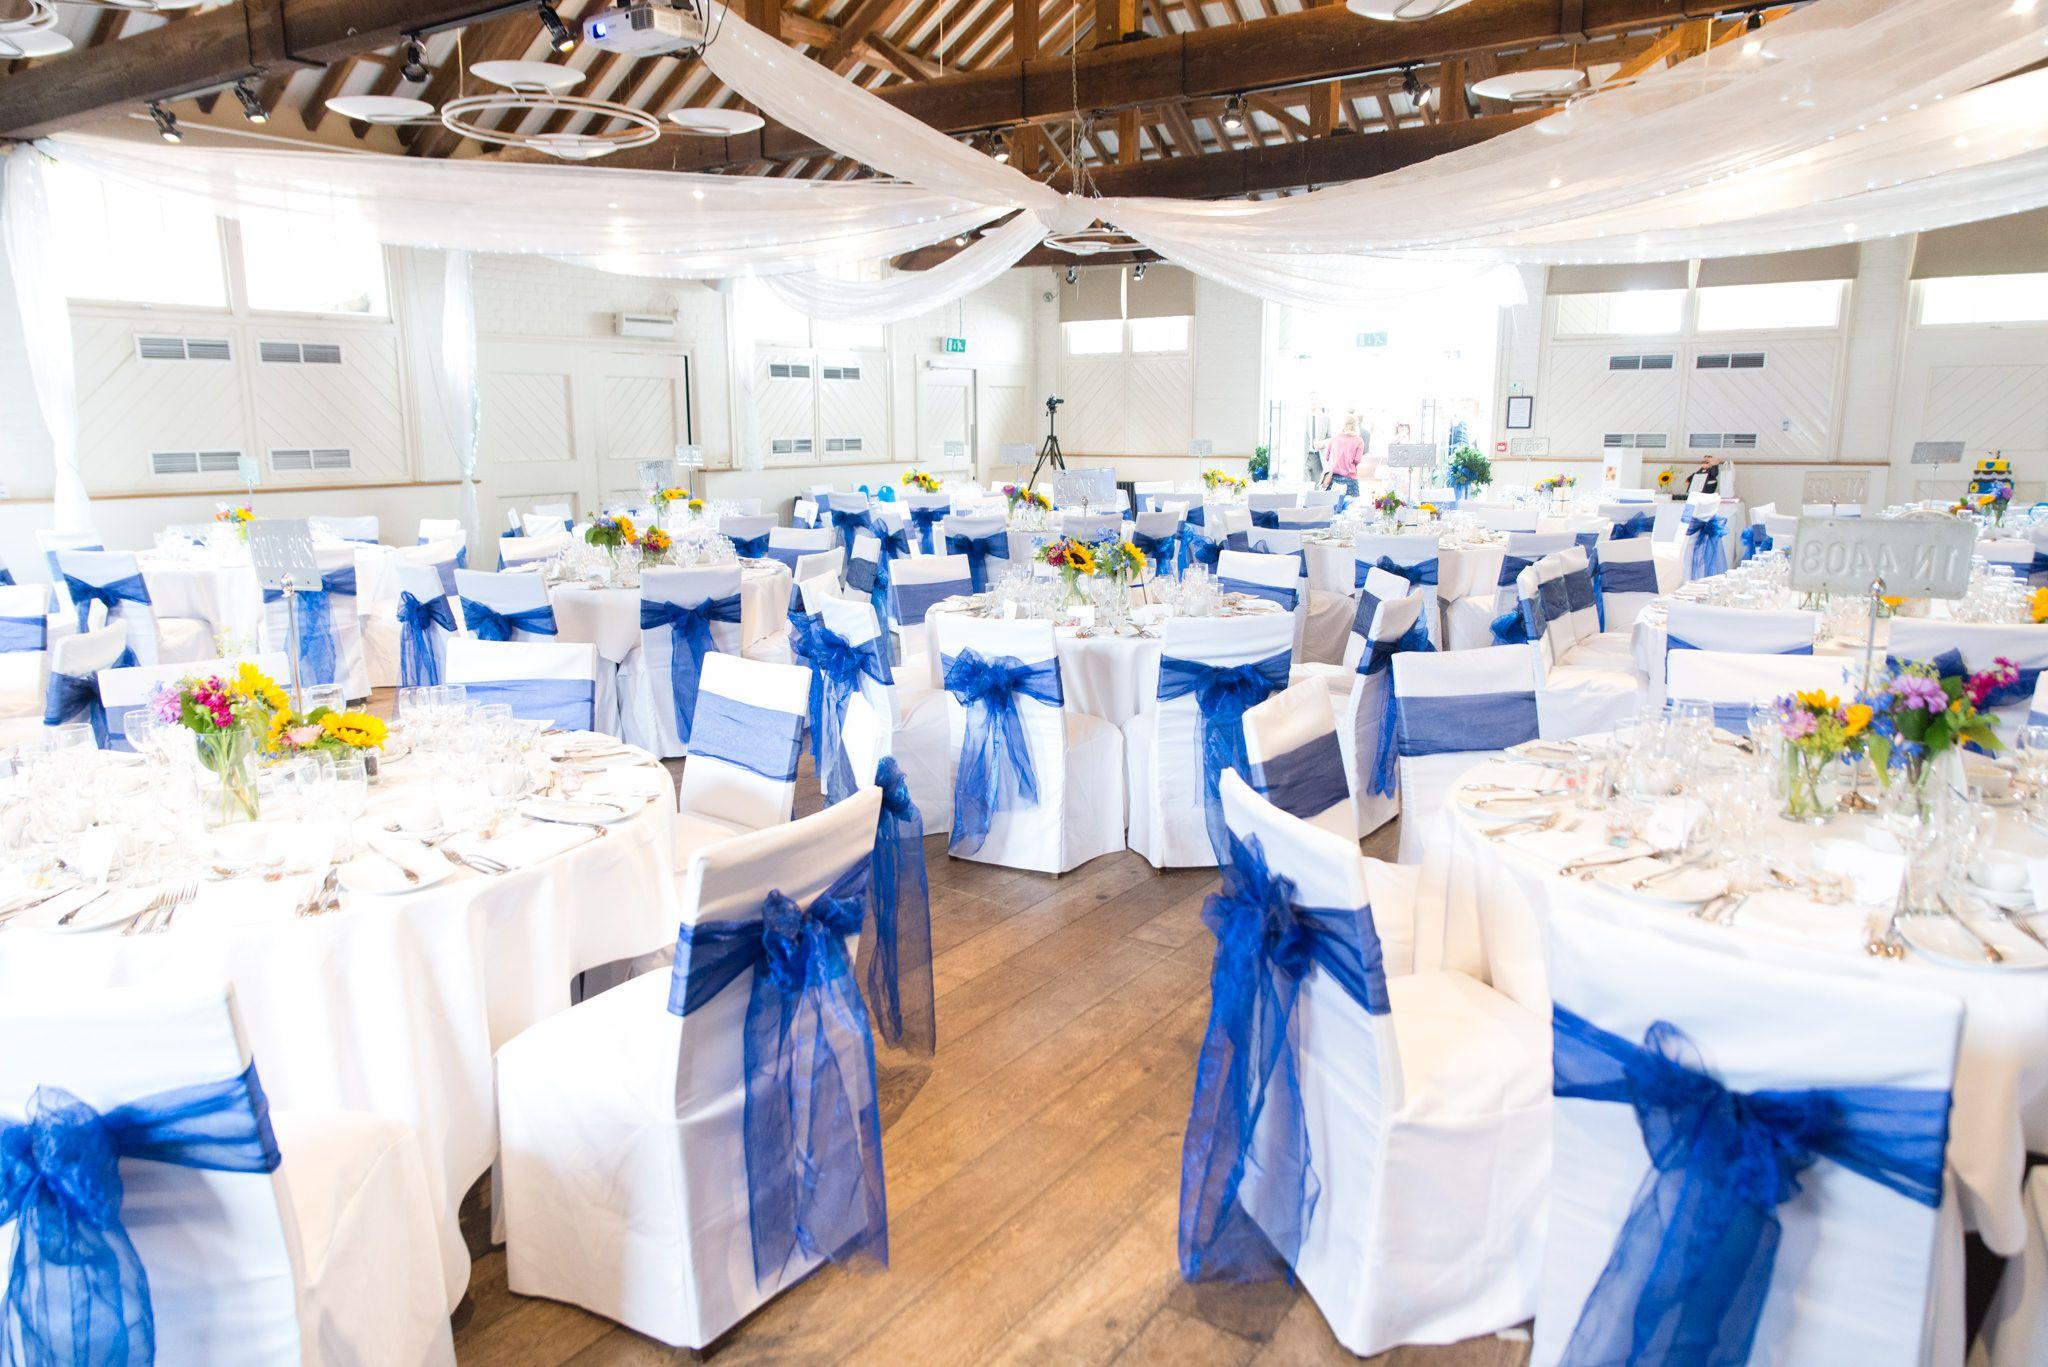 Ridings Barn Theobalds Park Hertfordshire Wedding Venue